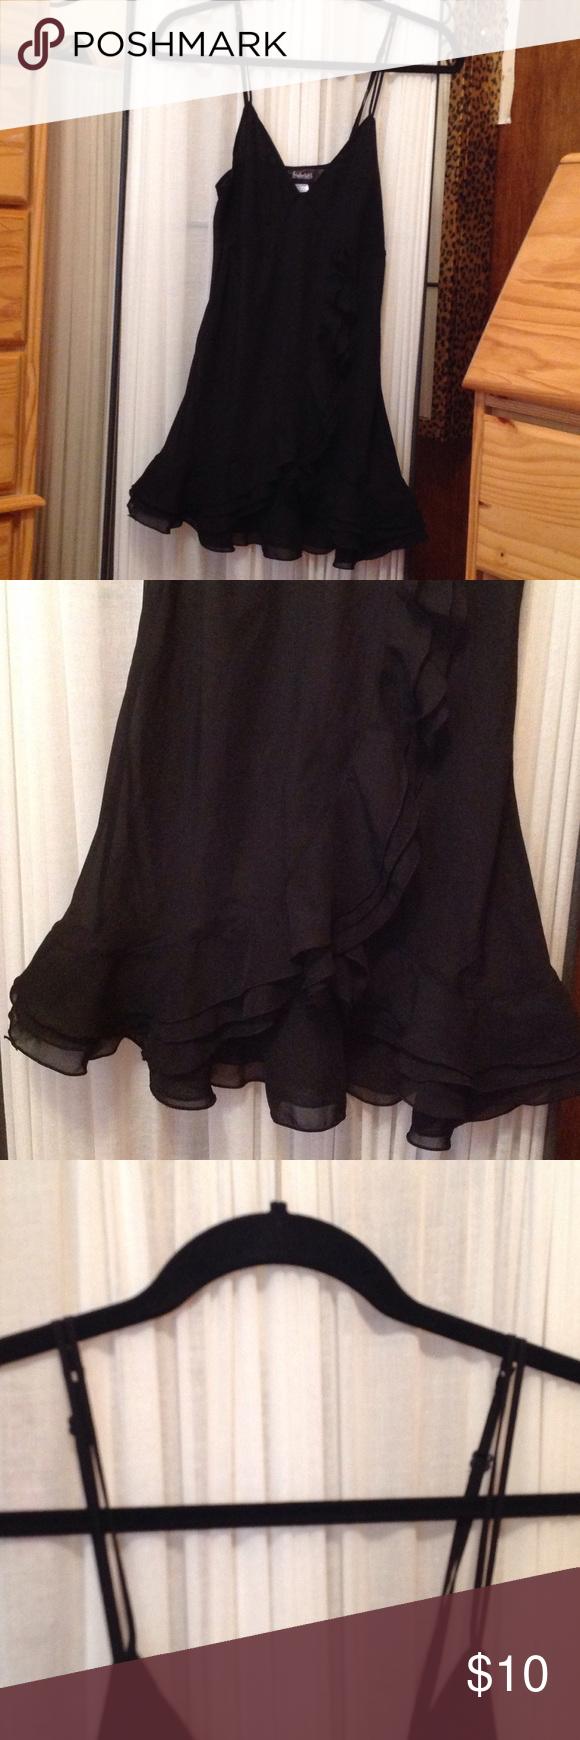 Black double strapped ruffle baby doll. Black double strapped ruffled baby doll.  The straps are adjustable. I got it from Fredericks size medium. Intimates & Sleepwear Chemises & Slips